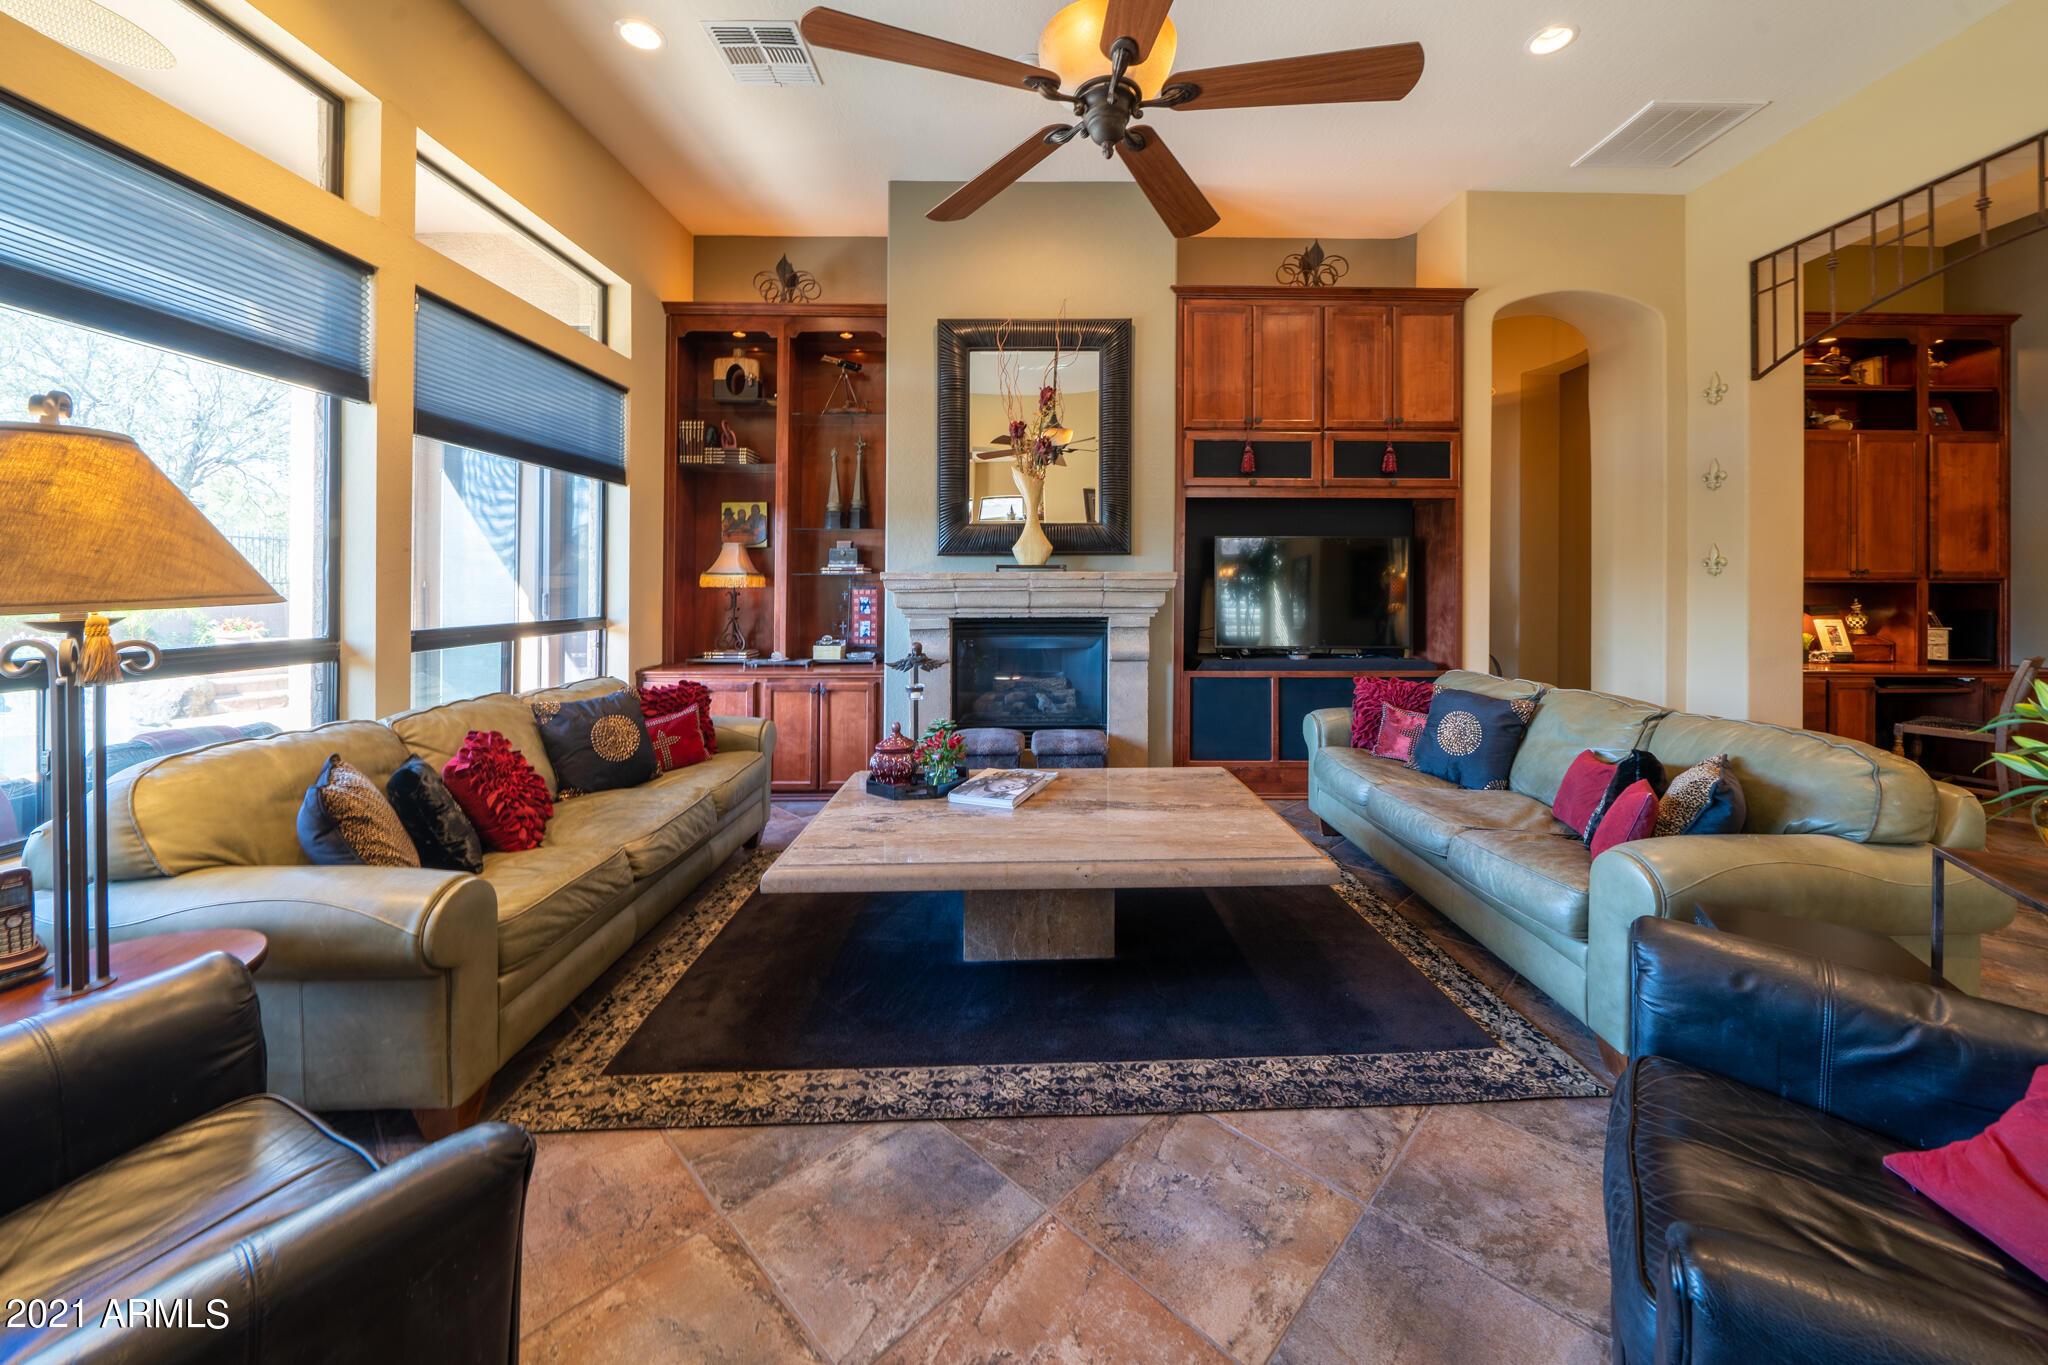 8044 TETON Circle, Mesa, Arizona 85207, 2 Bedrooms Bedrooms, ,2.5 BathroomsBathrooms,Residential,For Sale,TETON,6234558